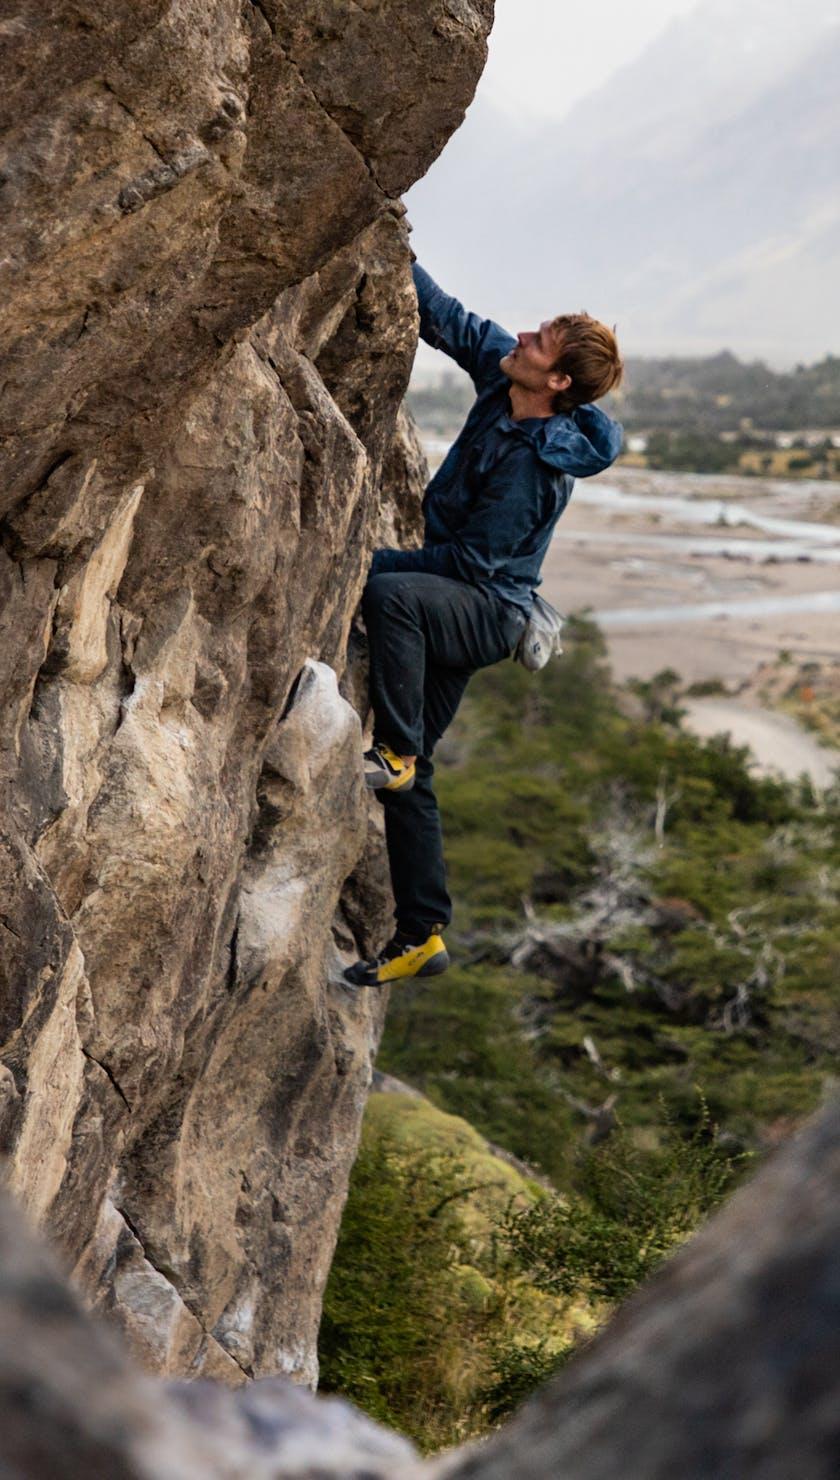 BD Athlete Nalle Hukkataival in Patagonia